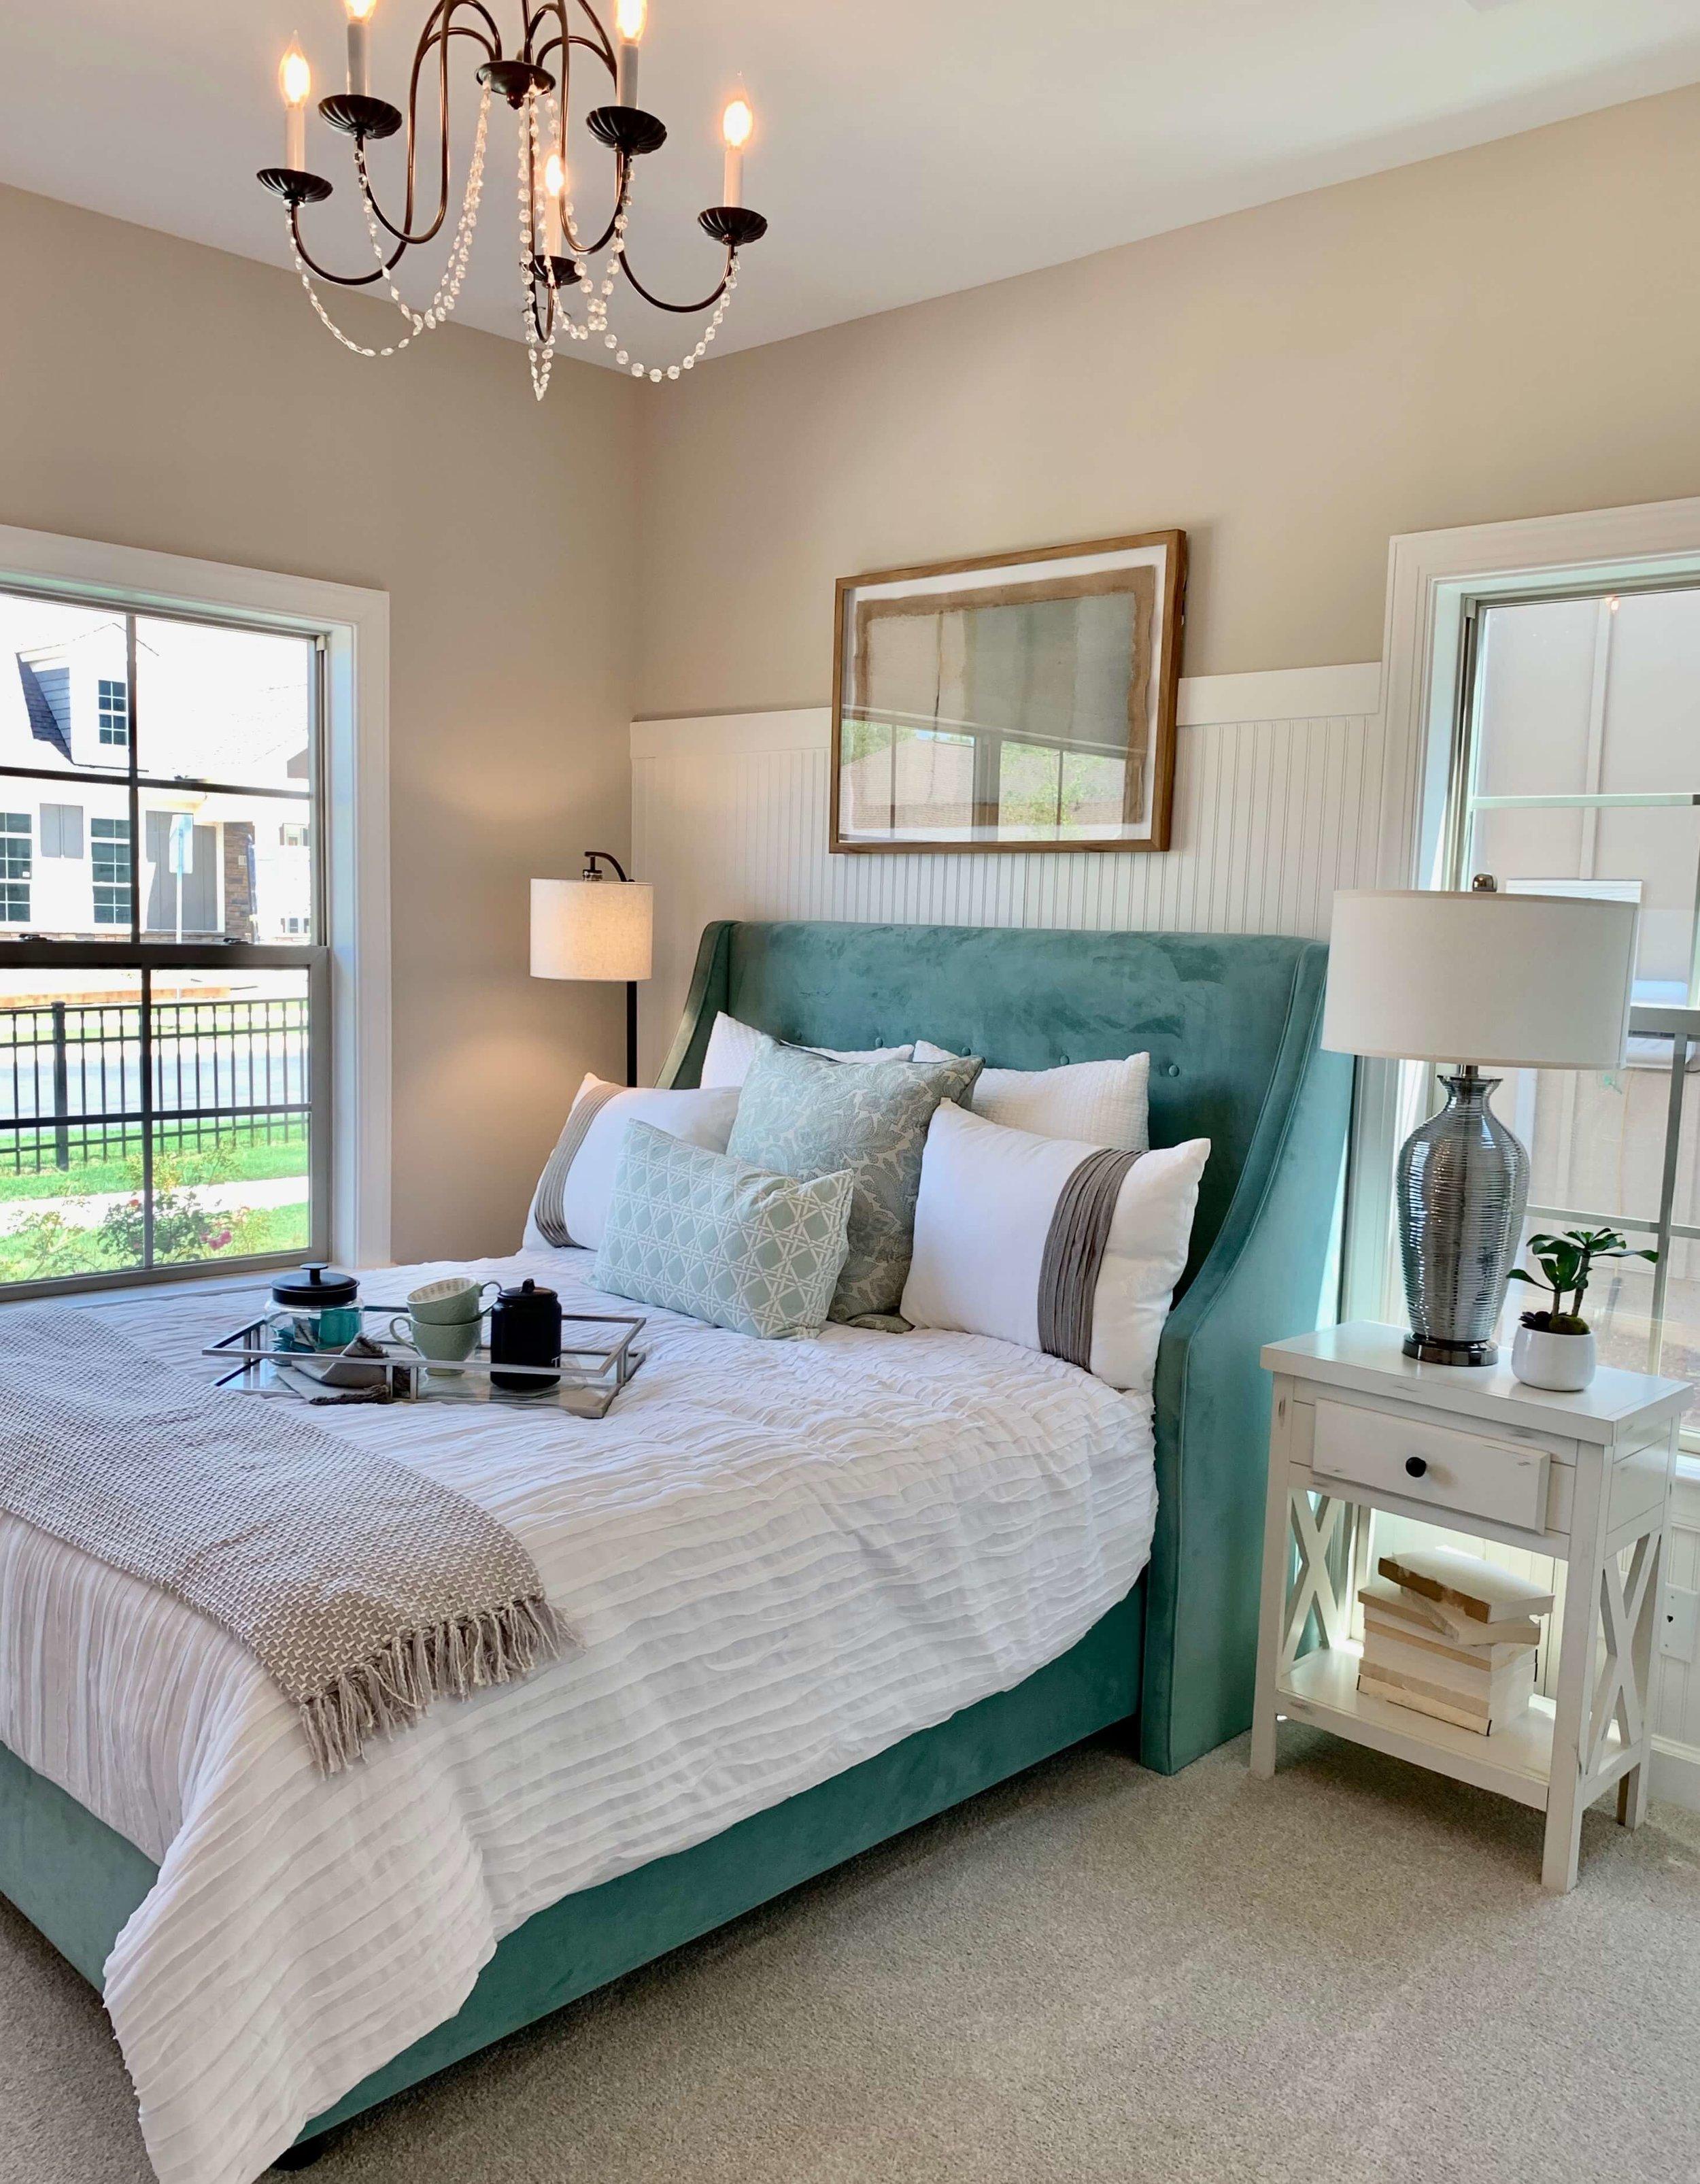 guest-room-model_home-ideas.jpeg